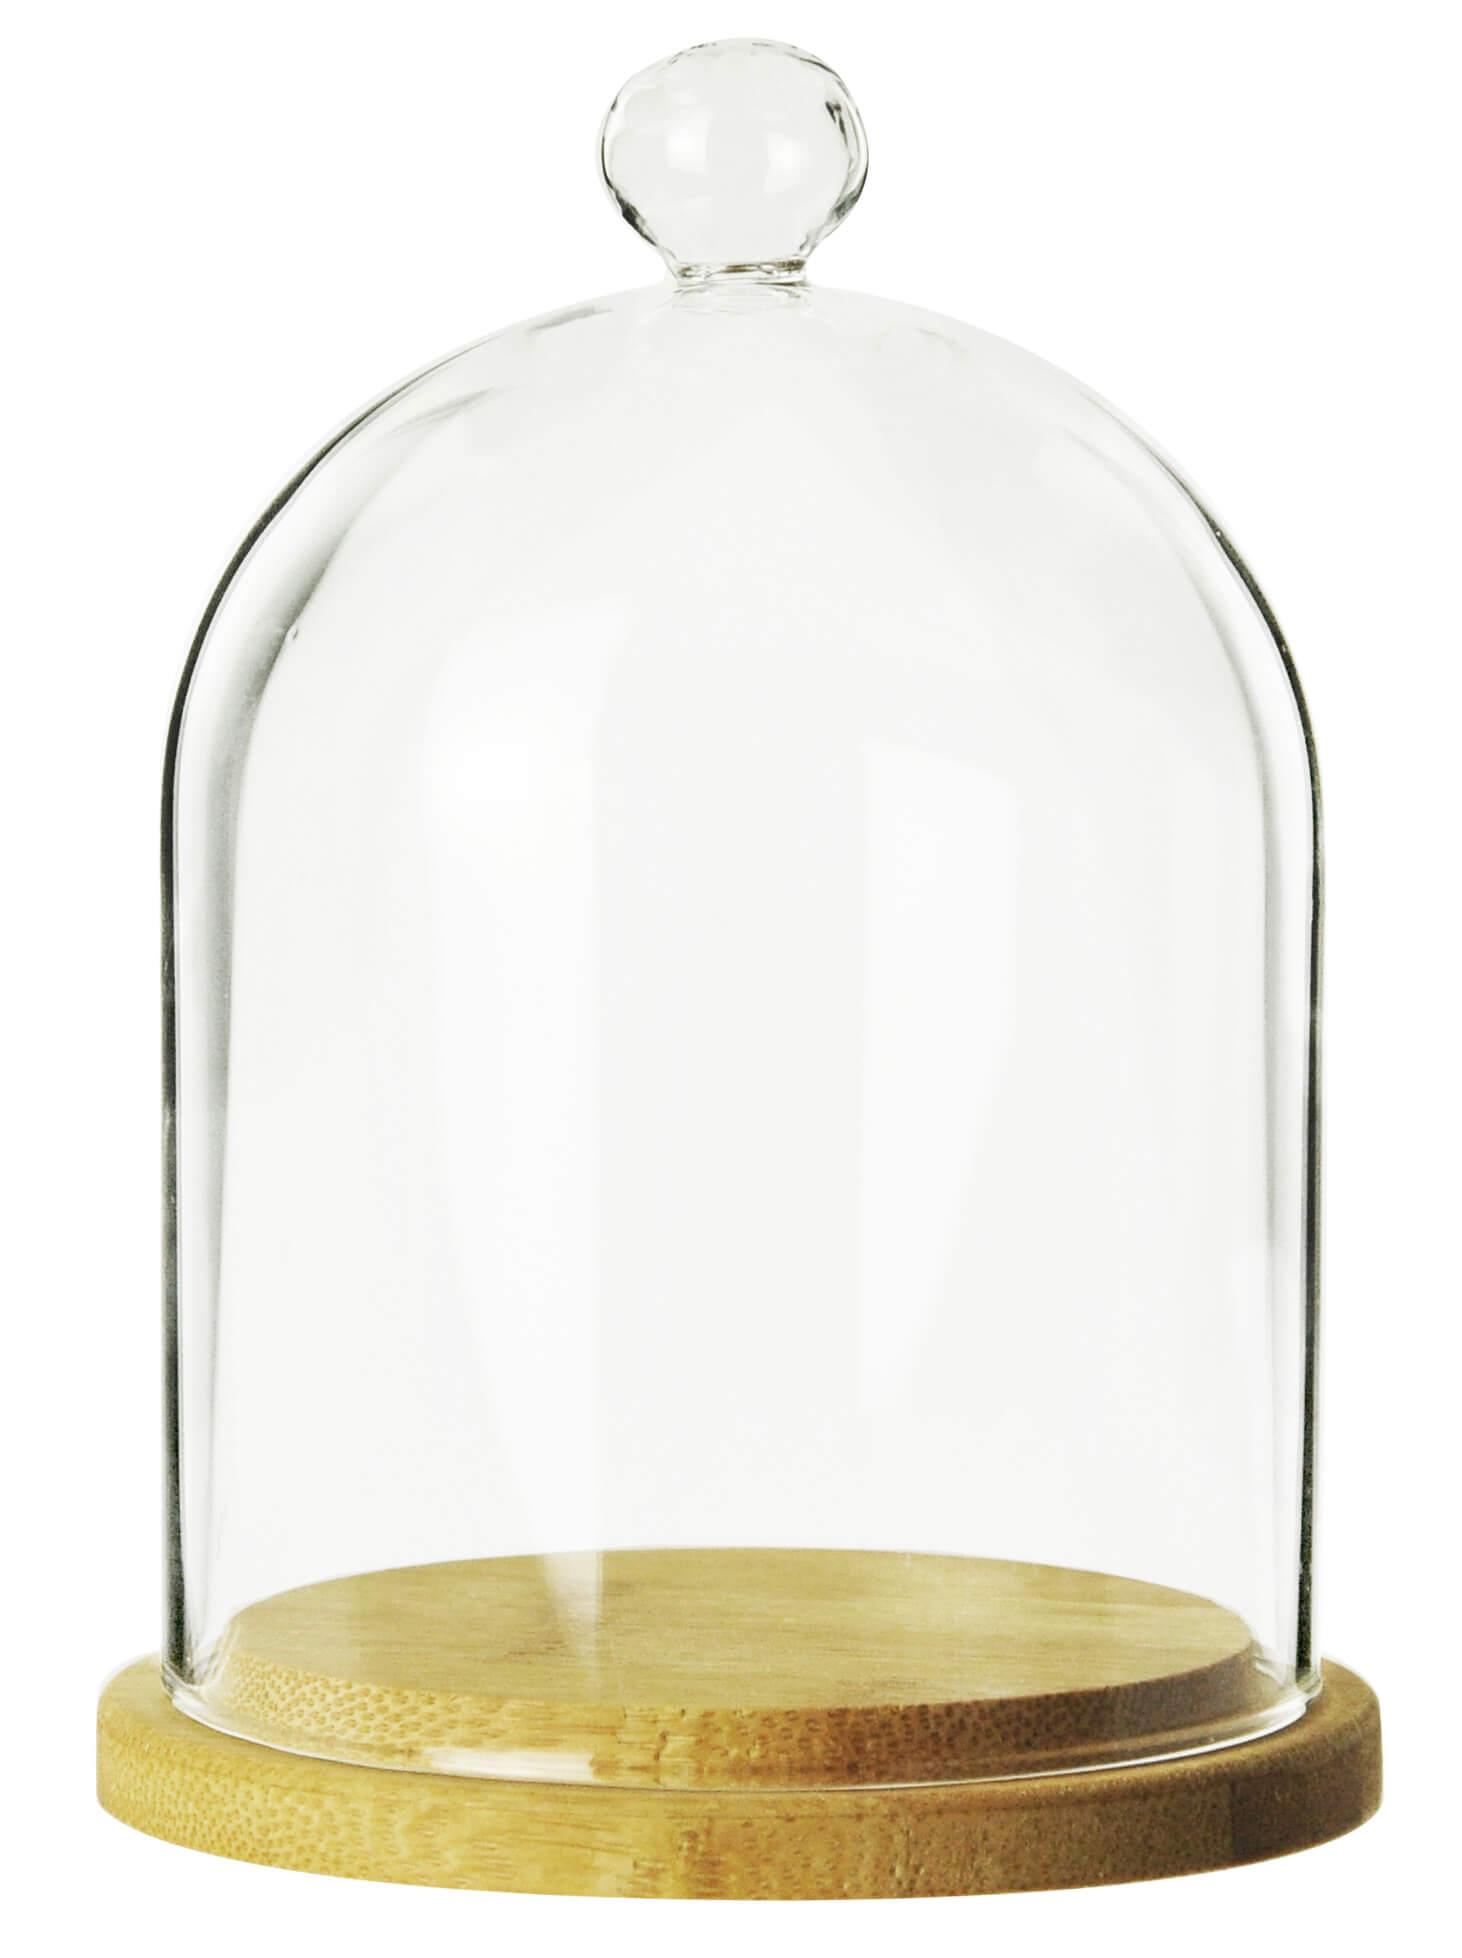 glasglocke mit holzteller 14cm glashaube glaskuppel muffin glocke glasdom haube 4260542960101 ebay. Black Bedroom Furniture Sets. Home Design Ideas